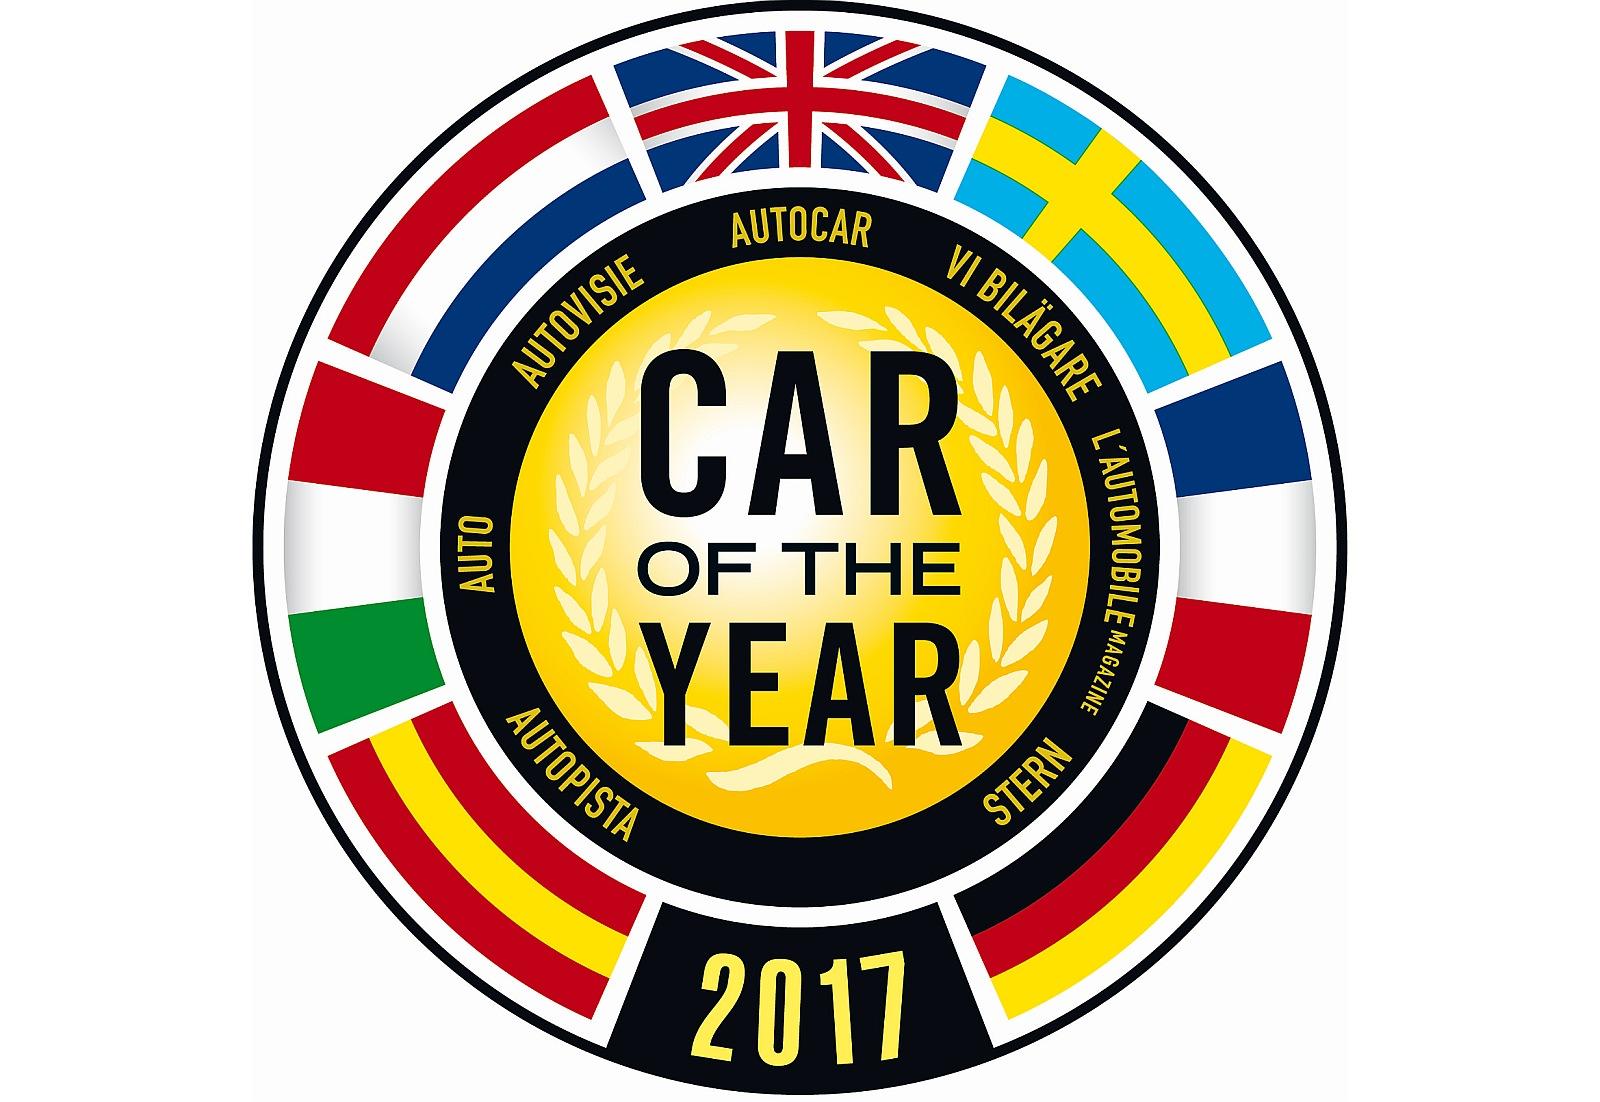 Európske Auto roka 2017 je Peugeot 3008